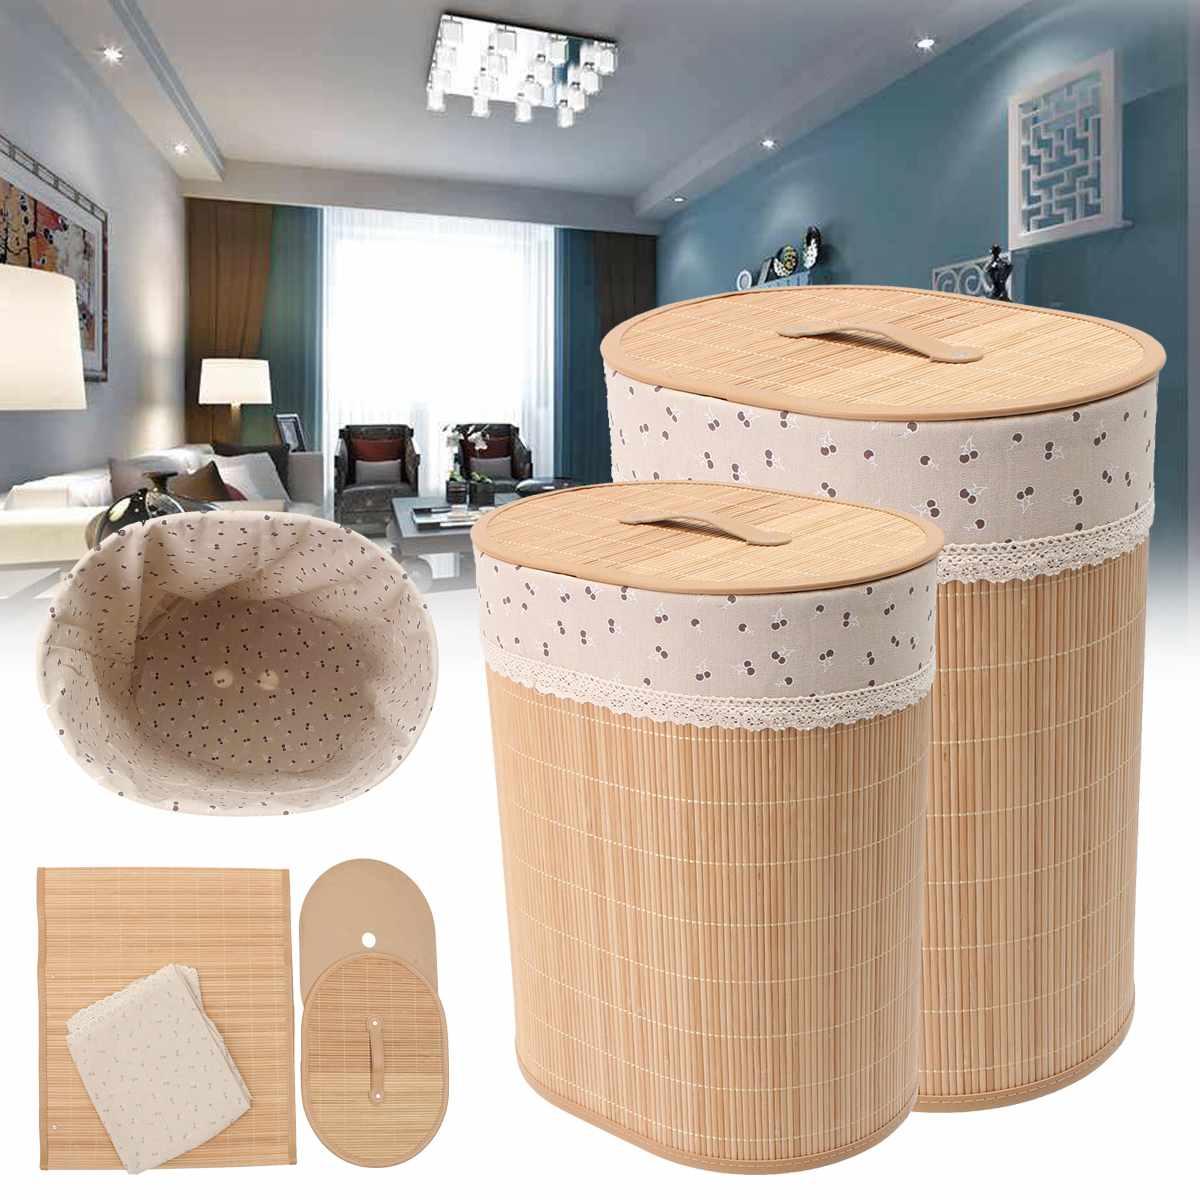 Household Bamboo Laundry Basket Clothes Toy Storage Folding Hamper Sorter Bin Organizer Laundry Hamper Bucket Collapsible Box